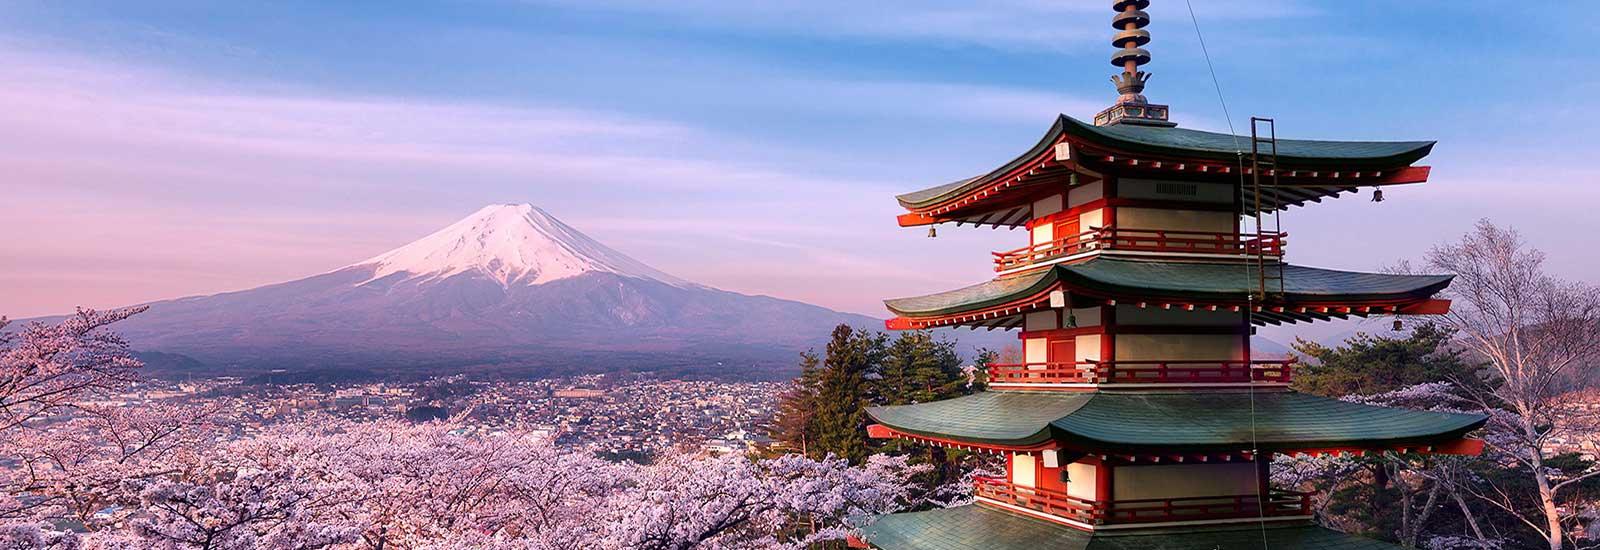 fuji hanami sakura